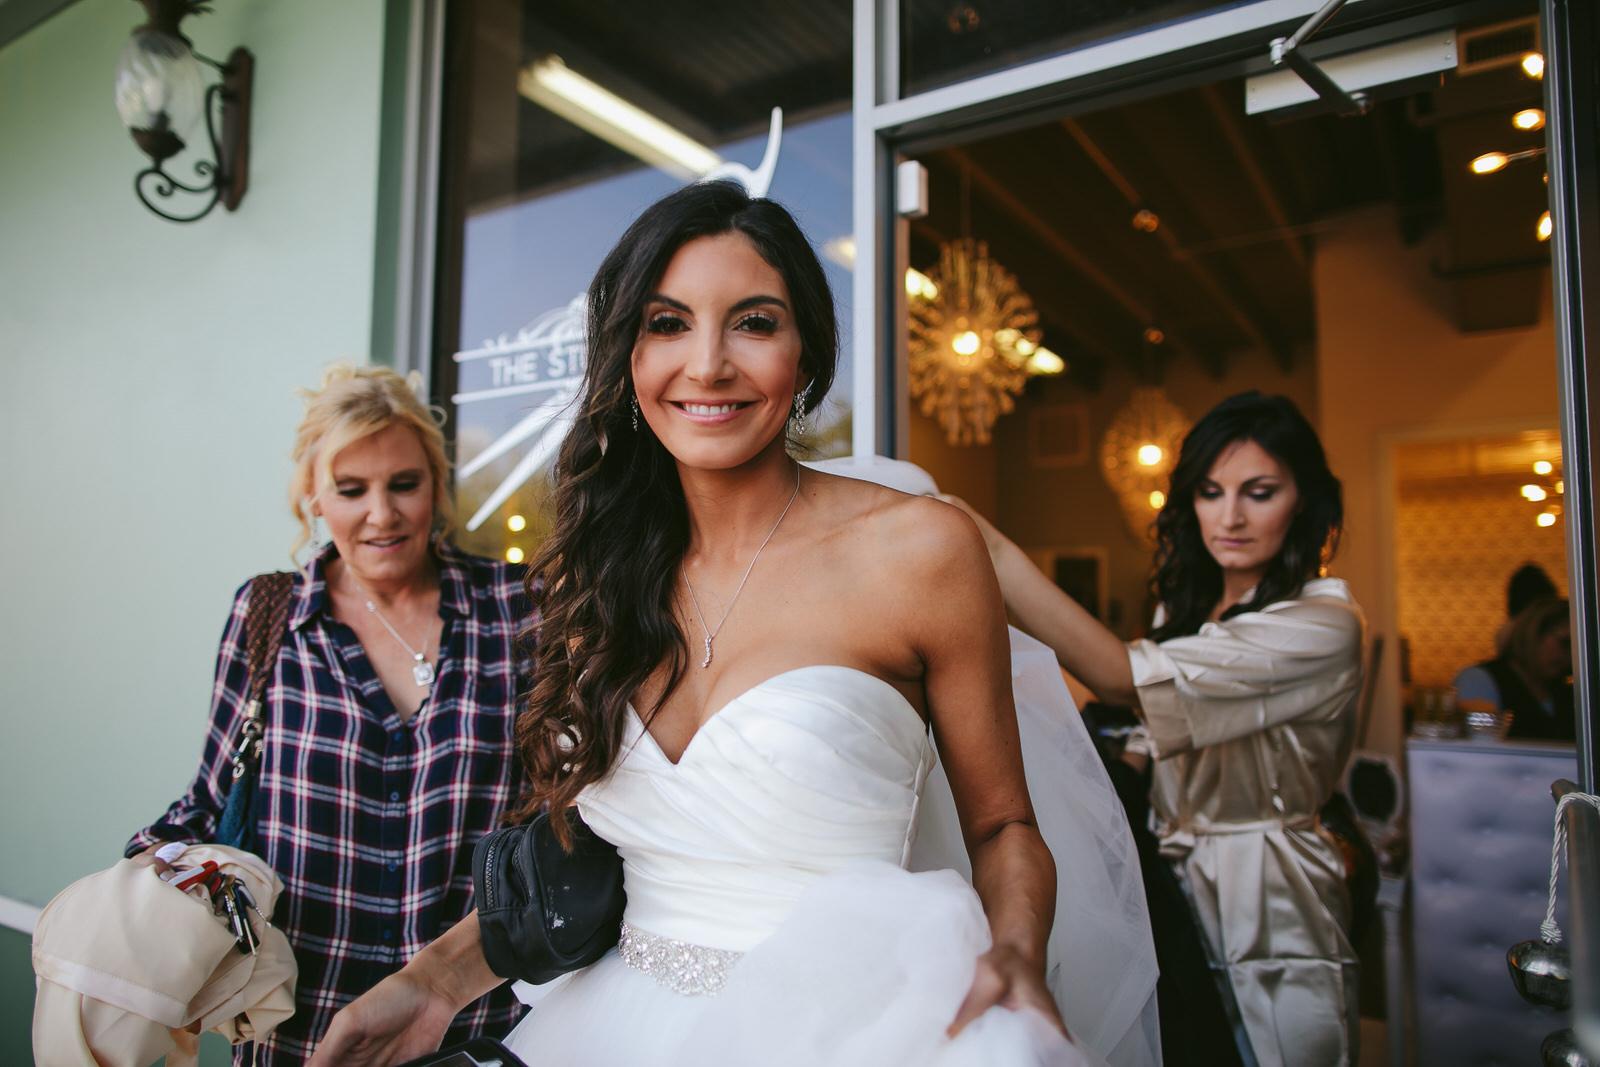 getting_ready_salon_wedding_day_stuart_wedding_photographer-179.jpg